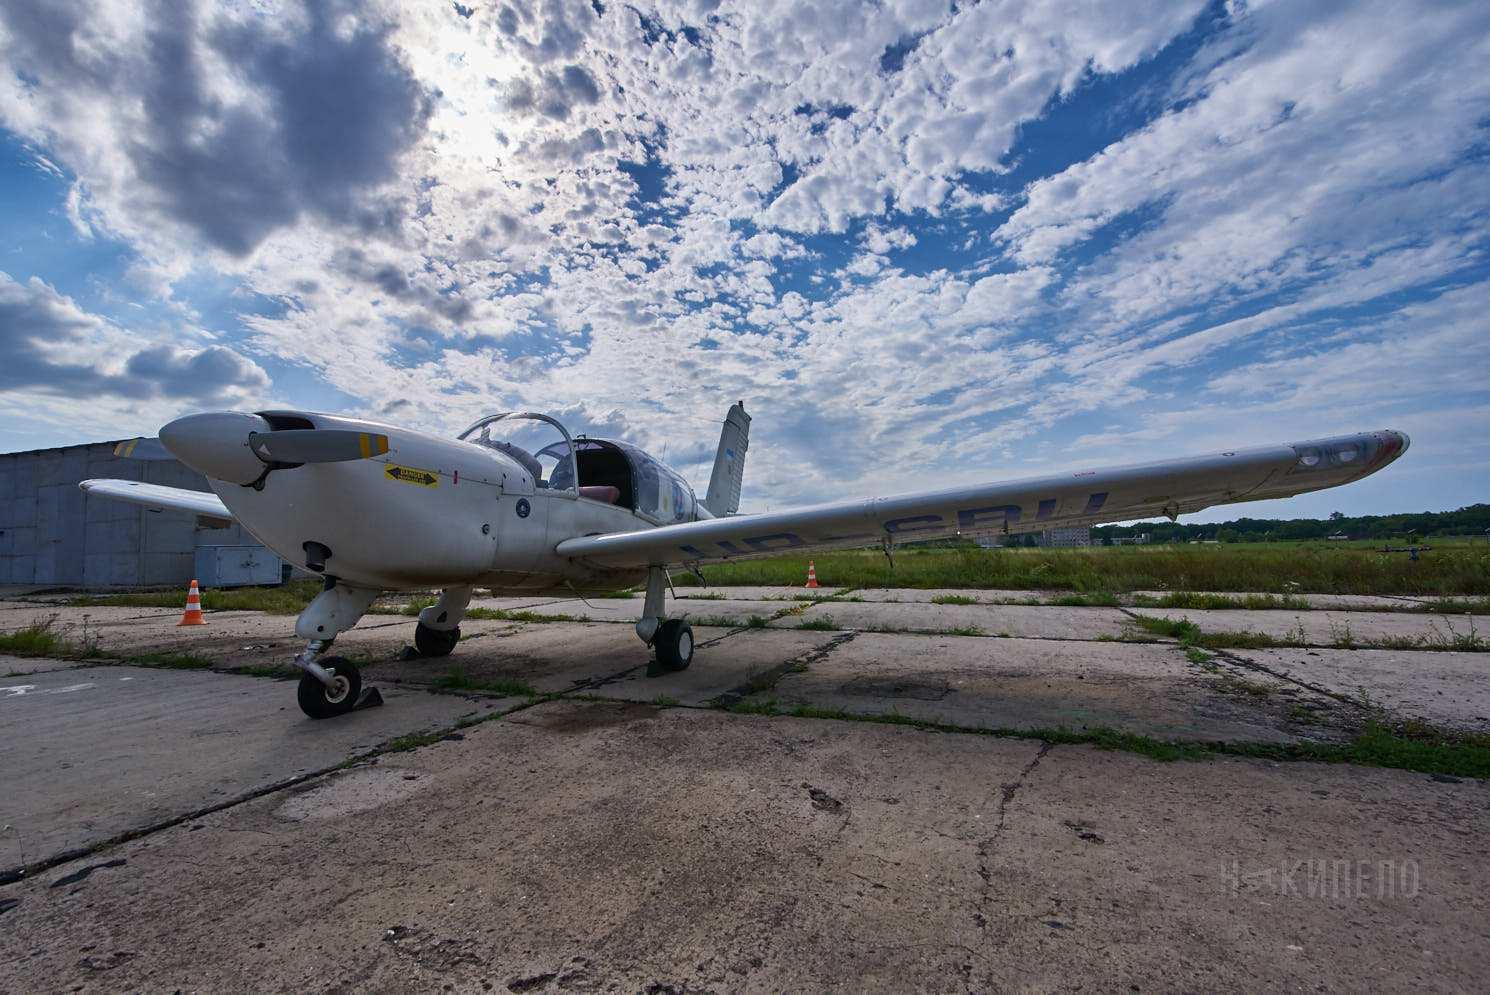 авиация сан юрий покусай хаз  Цивільний Повітряний Патруль самолет пилот штурвал кабина медицина